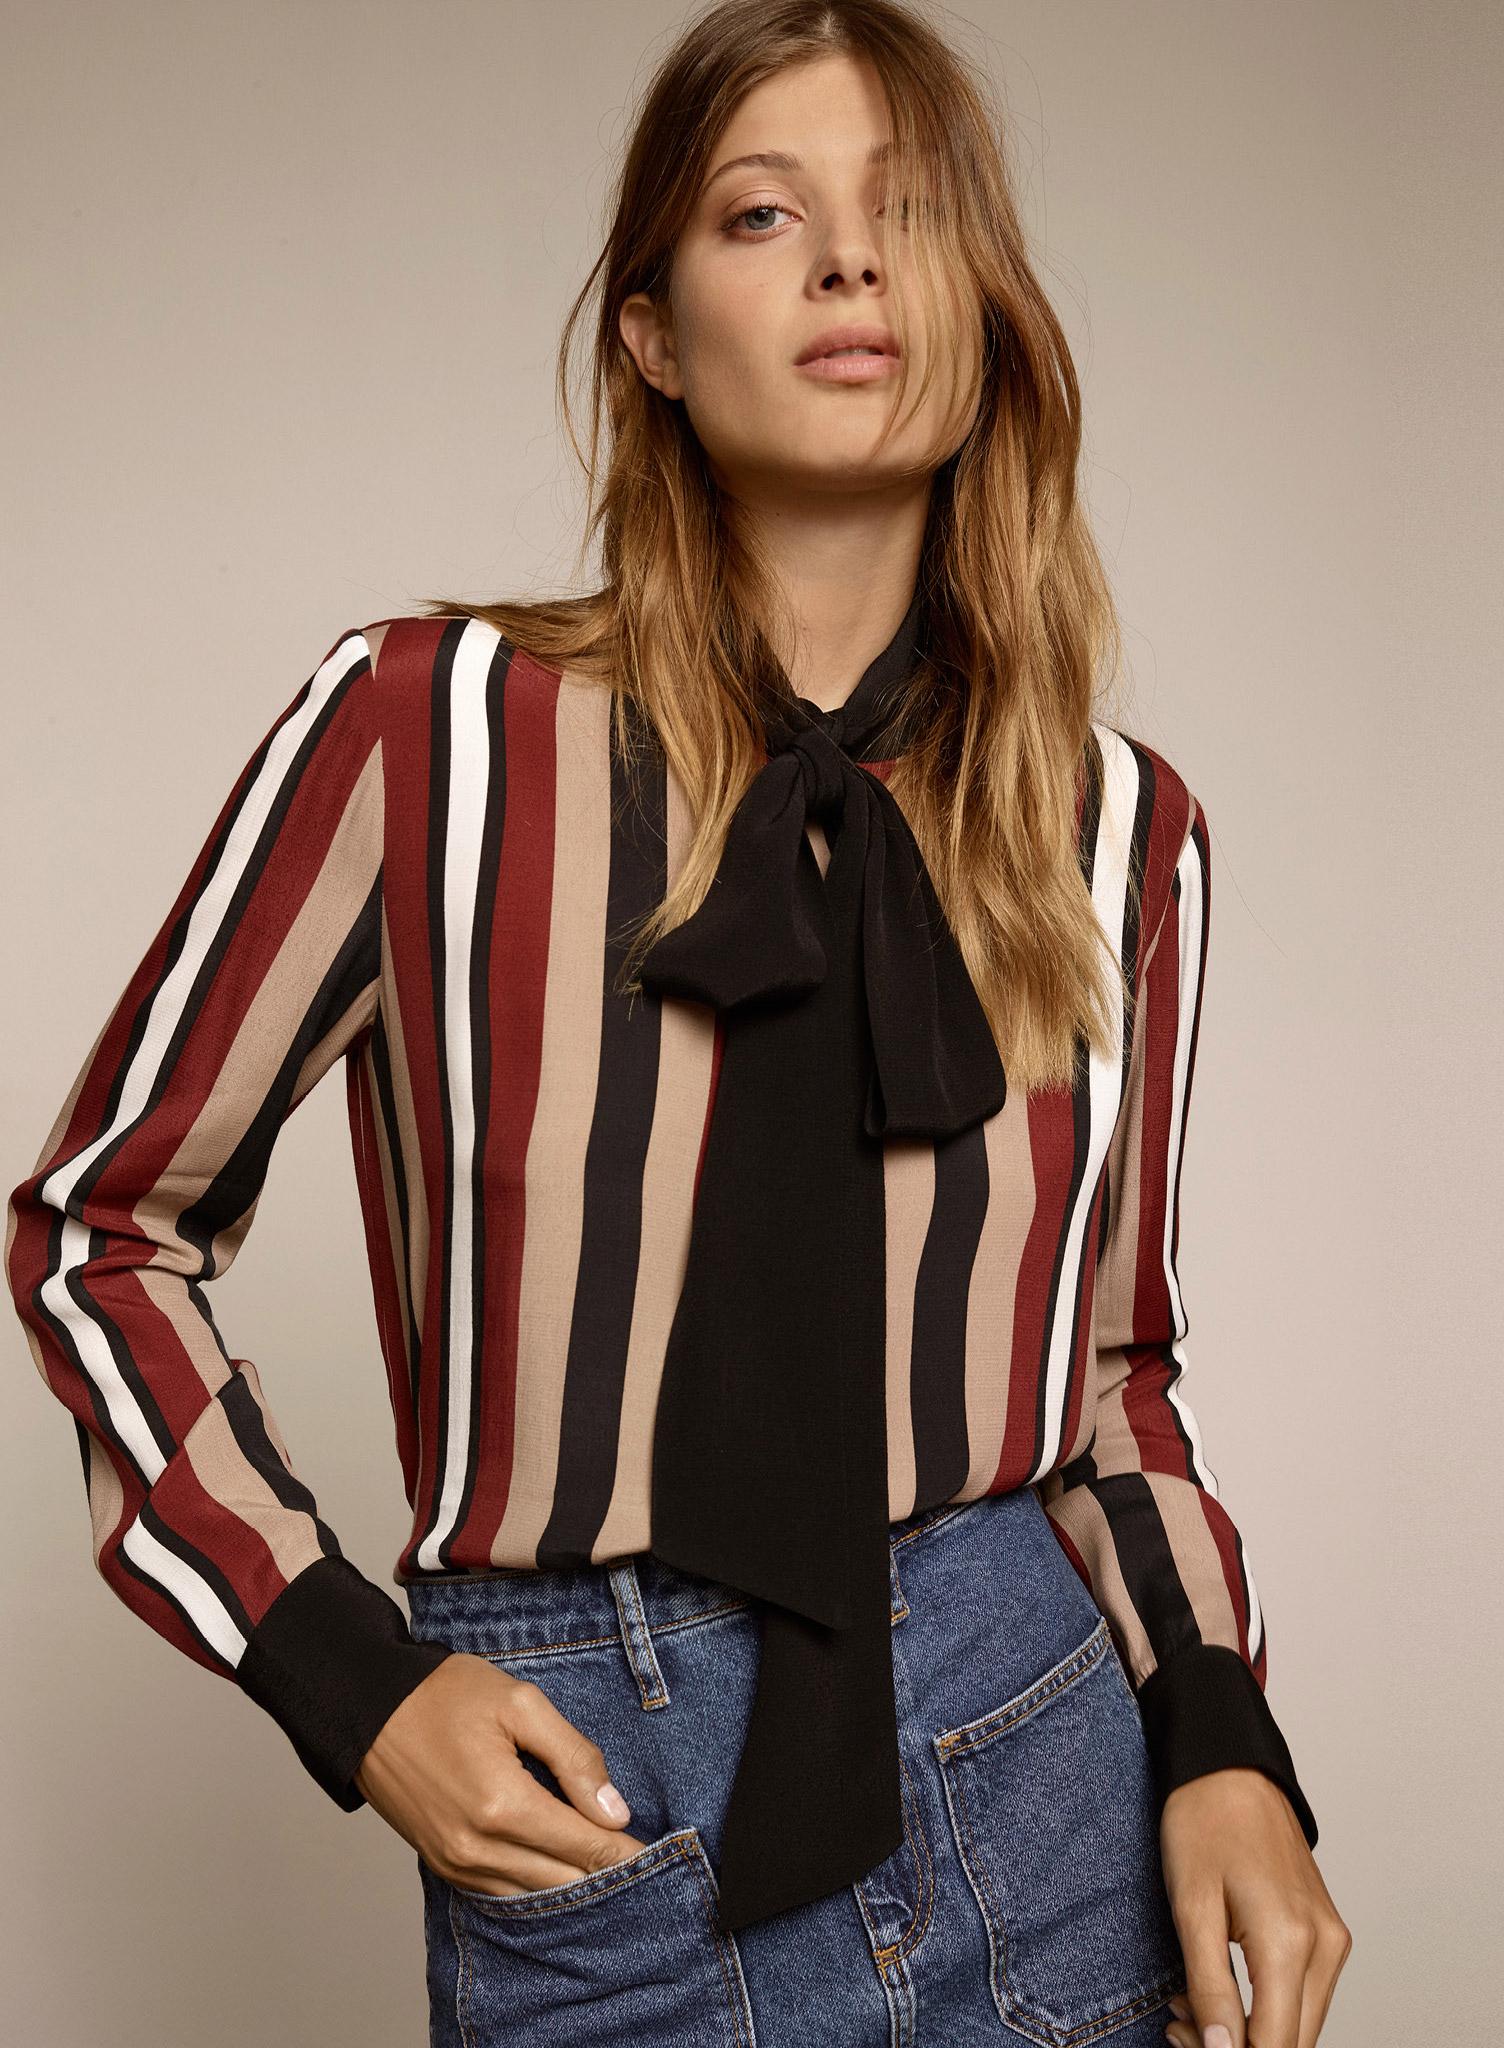 Women Shirt Styles